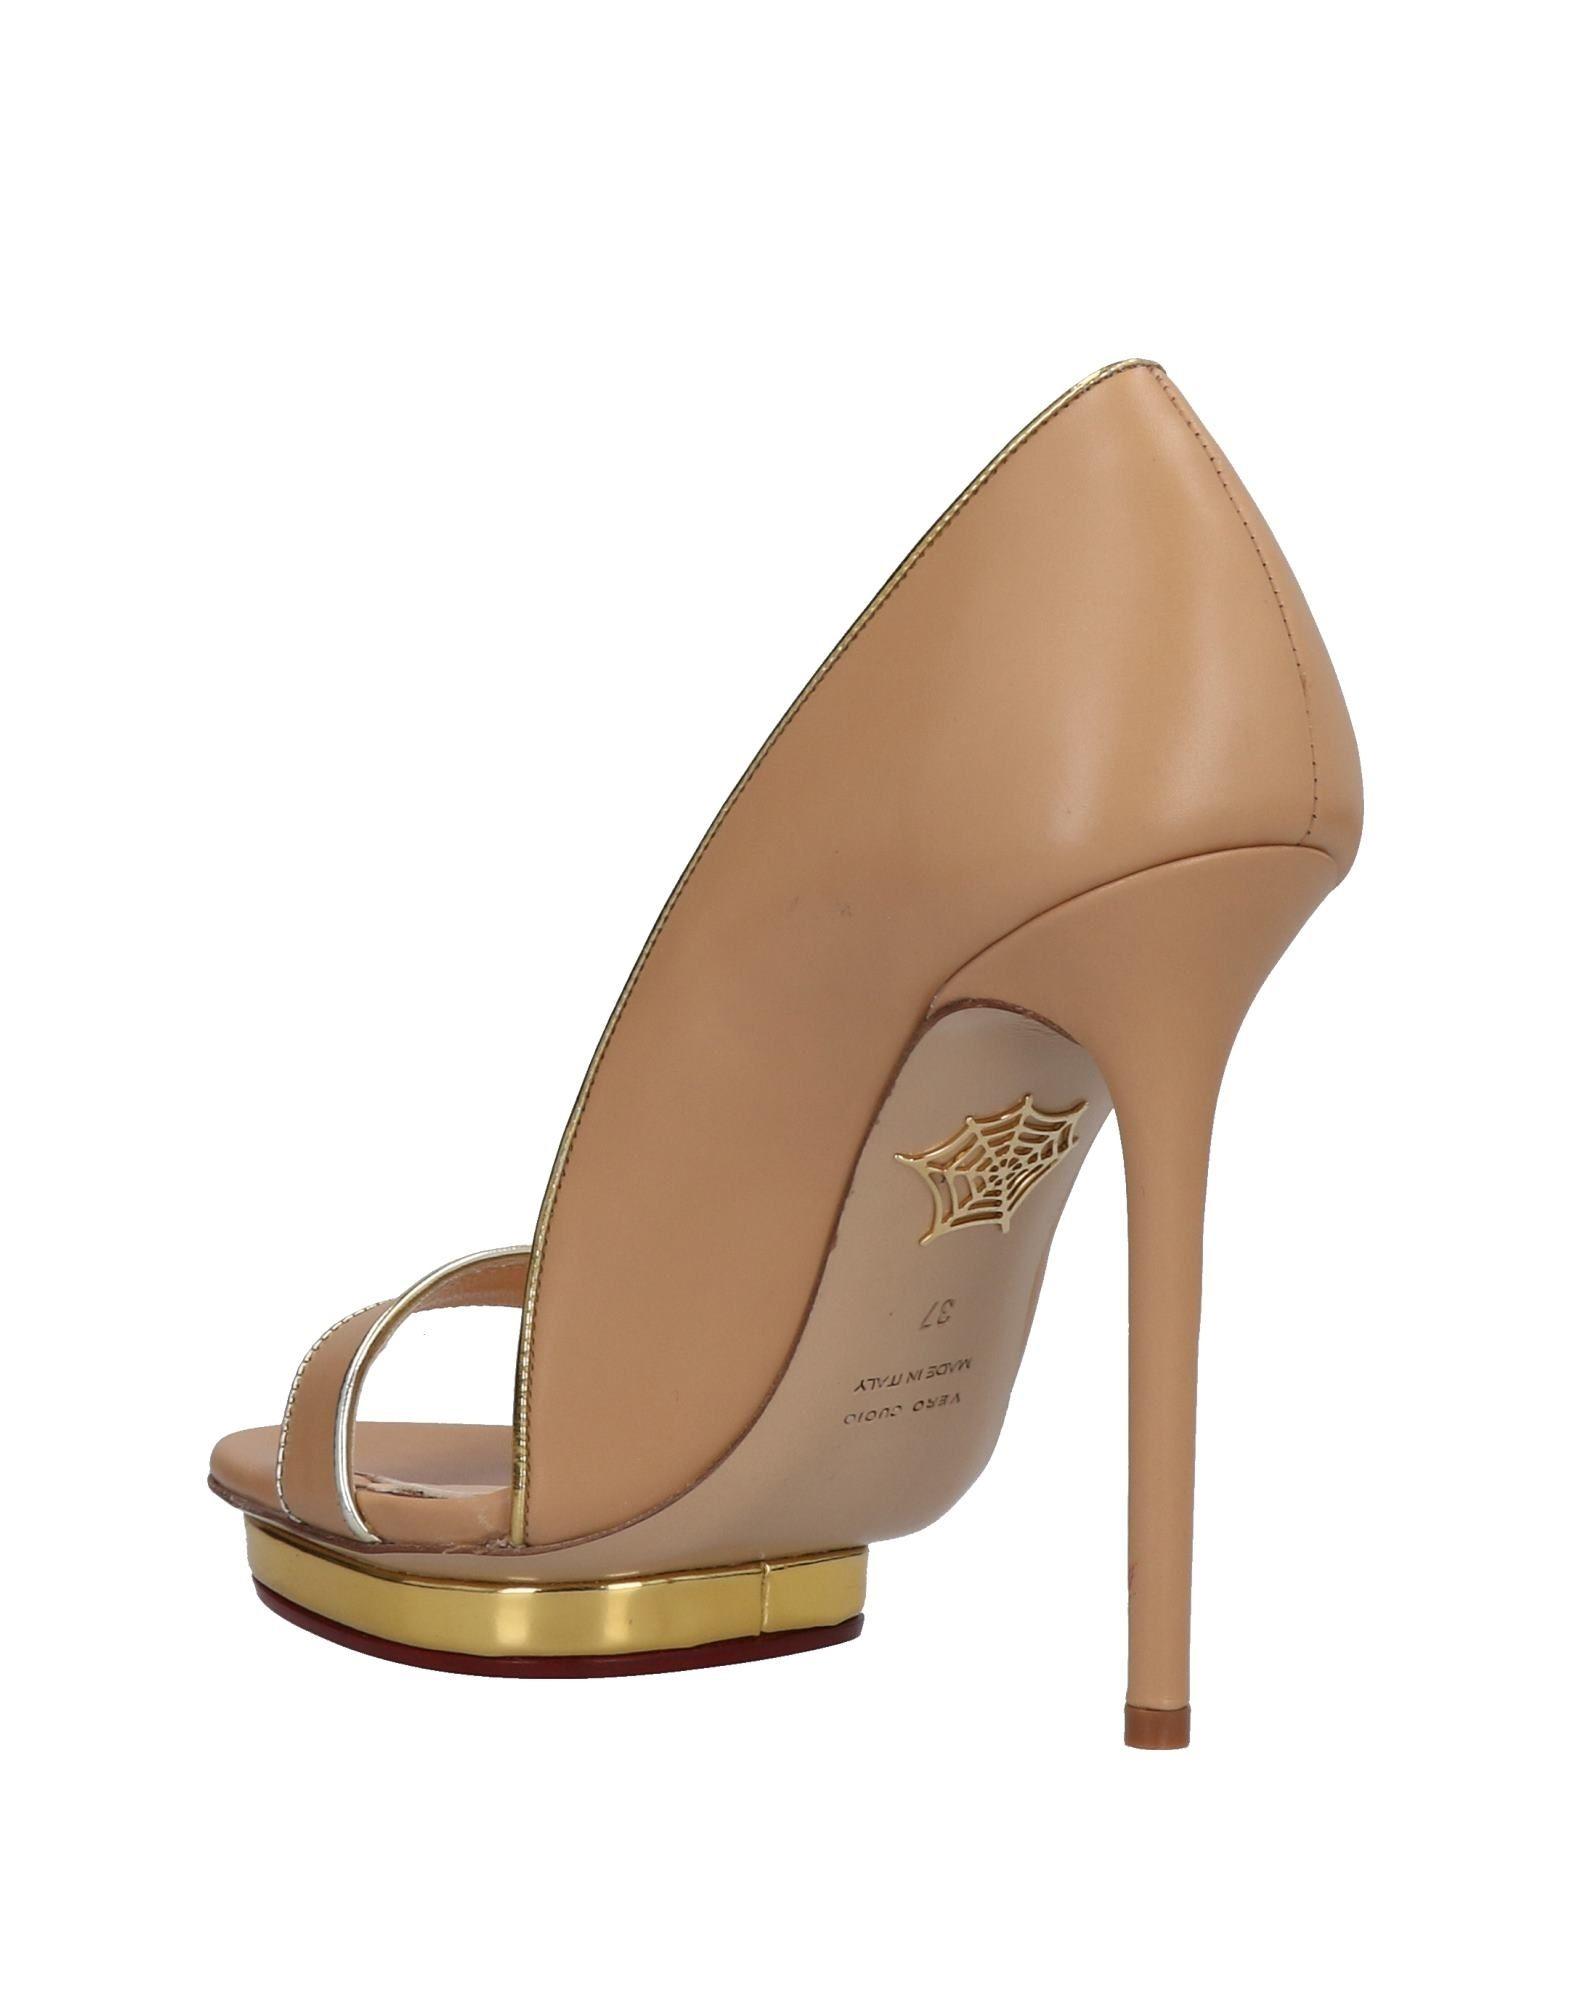 Rabatt Schuhe Pumps Charlotte Olympia Pumps Schuhe Damen  11476104UG 1b84b9